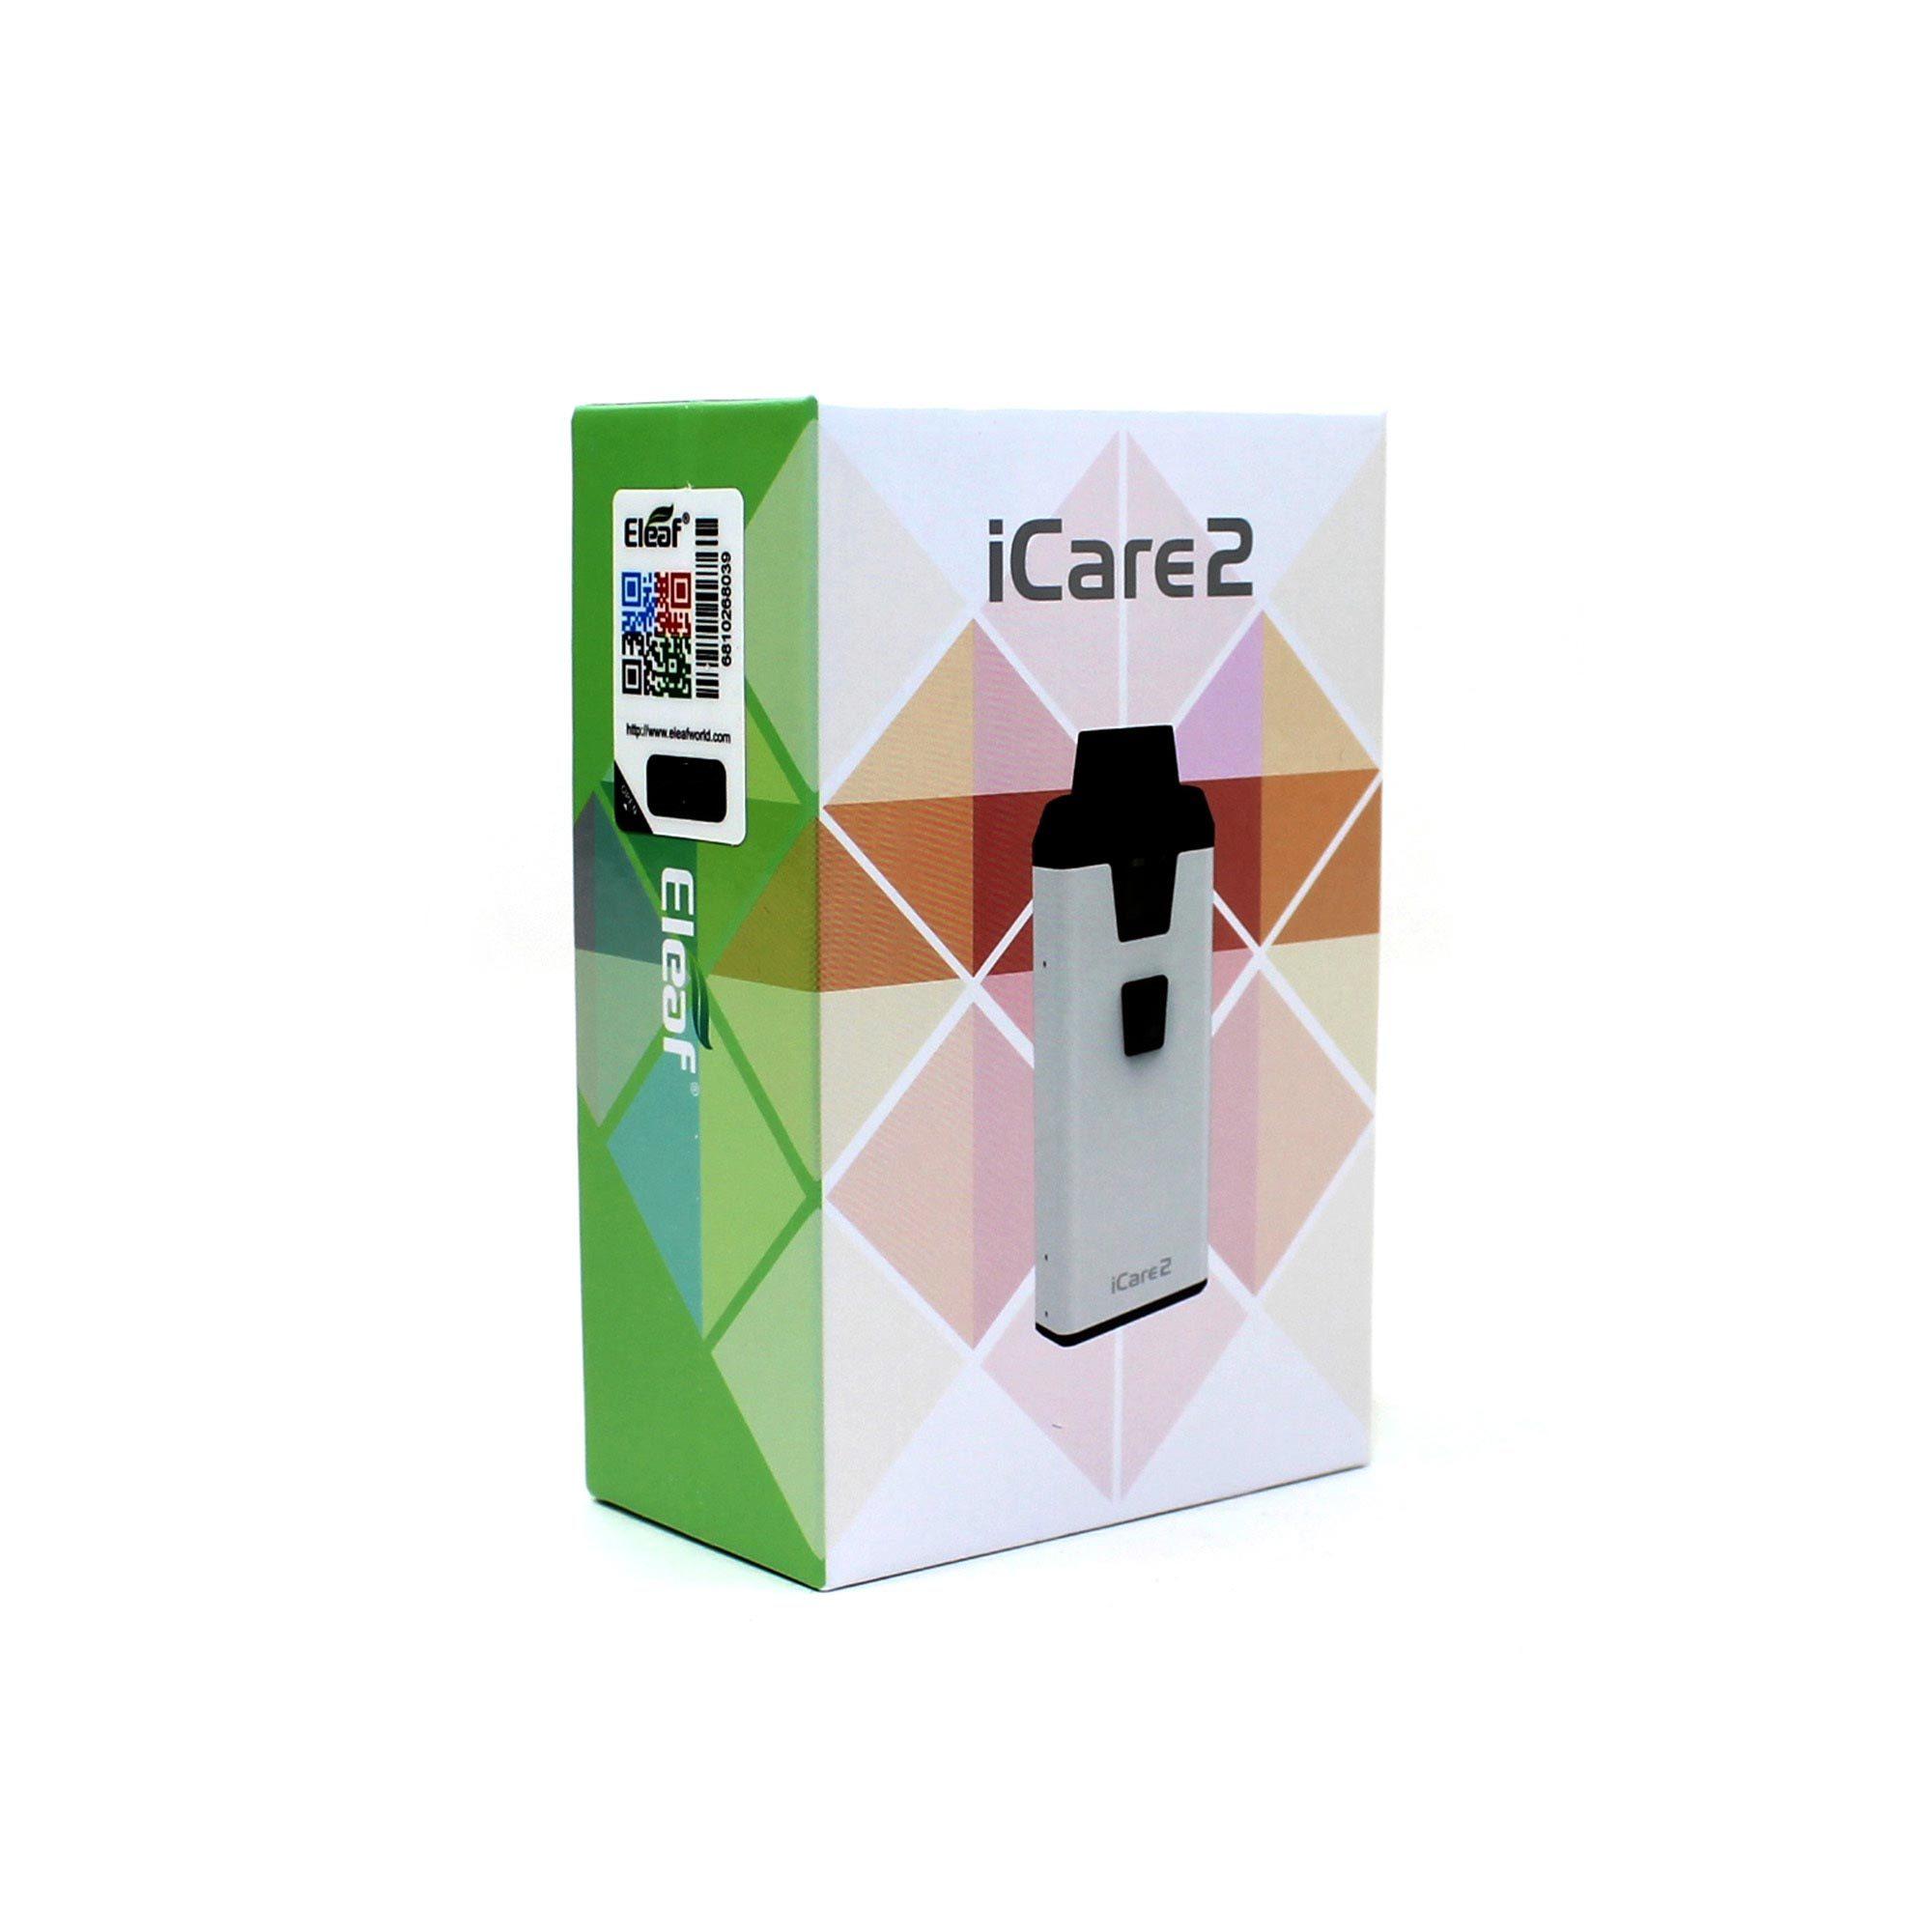 Электронная сигарета Eleaf iCare 2 коробка